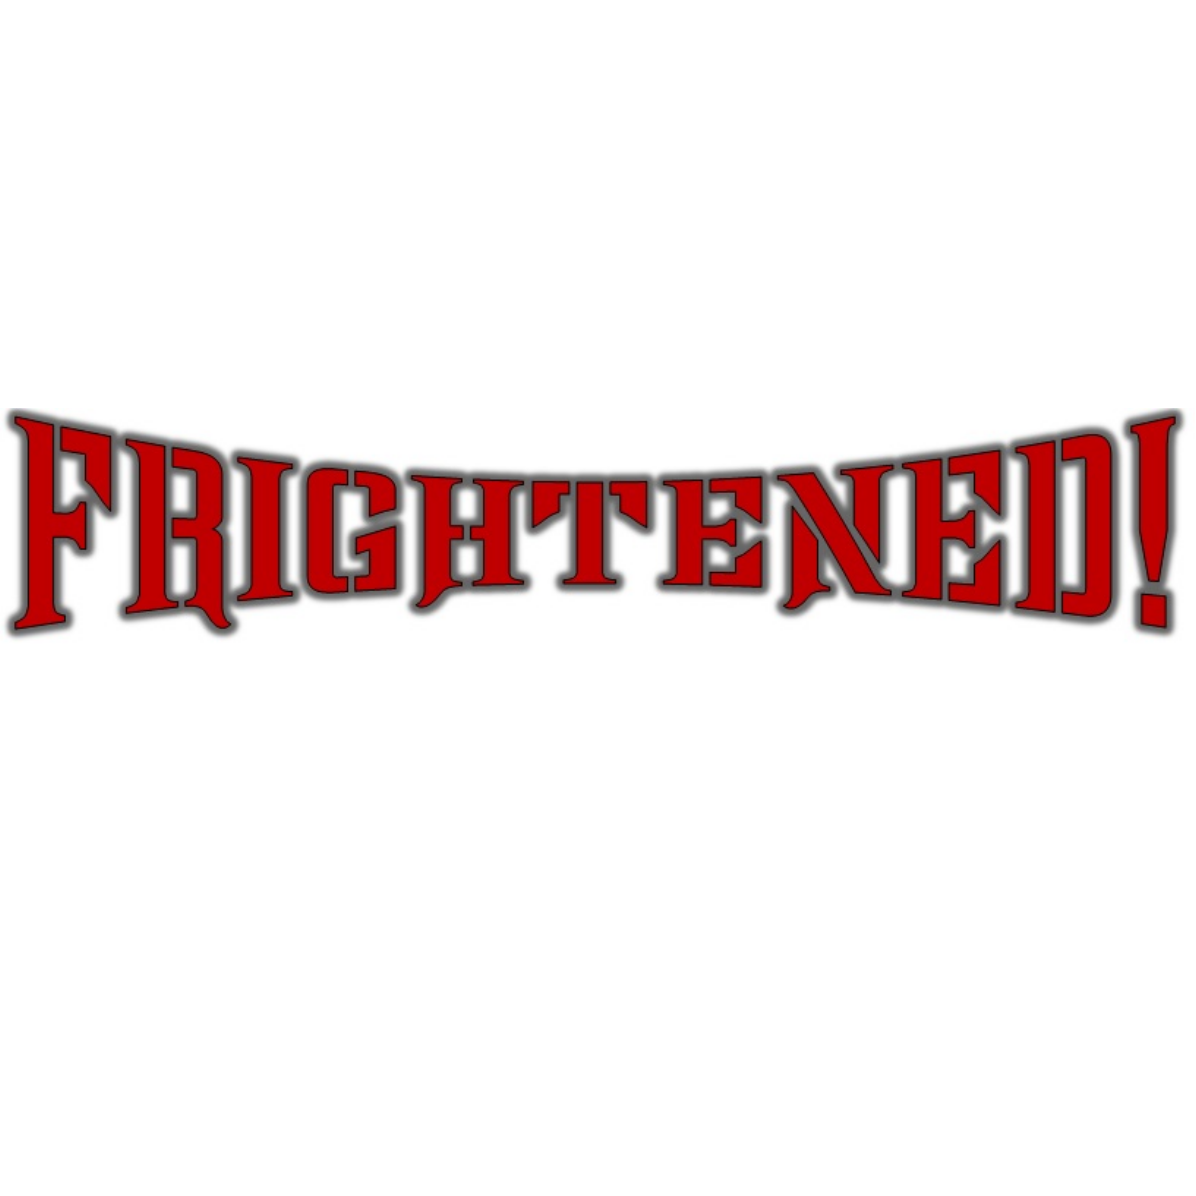 FRIGHTENED!